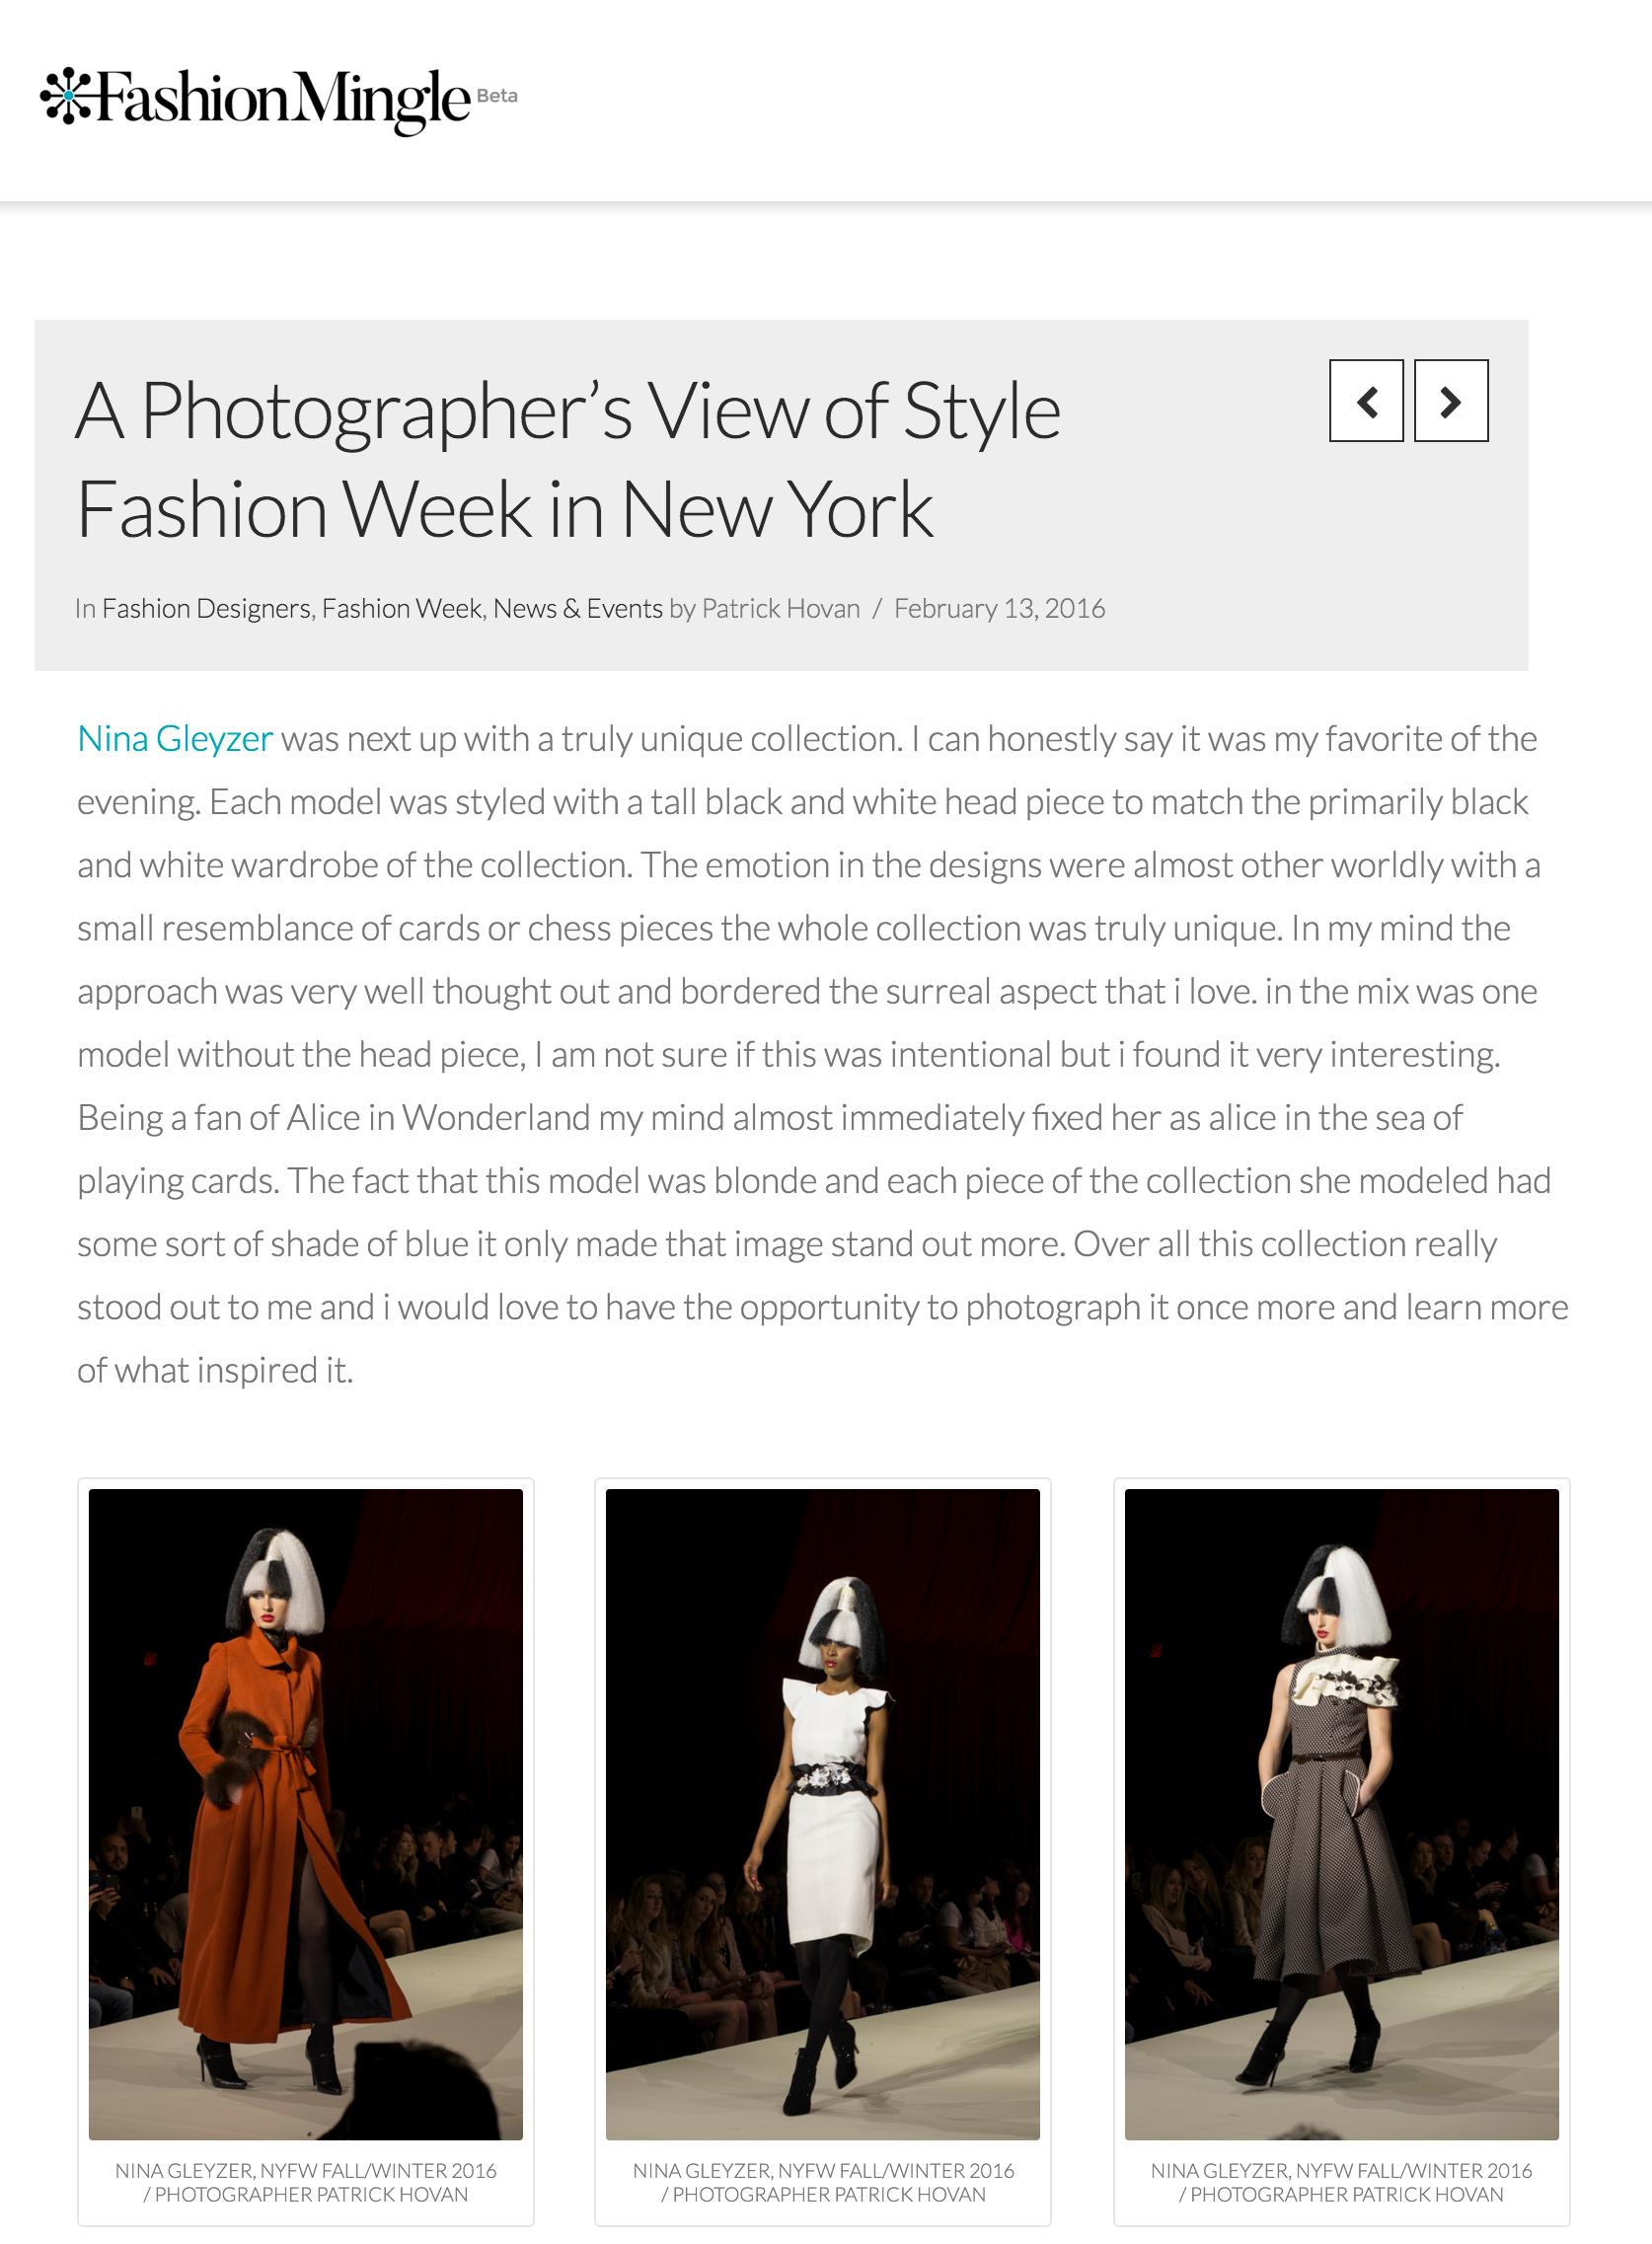 Fashion Mingle — 2016